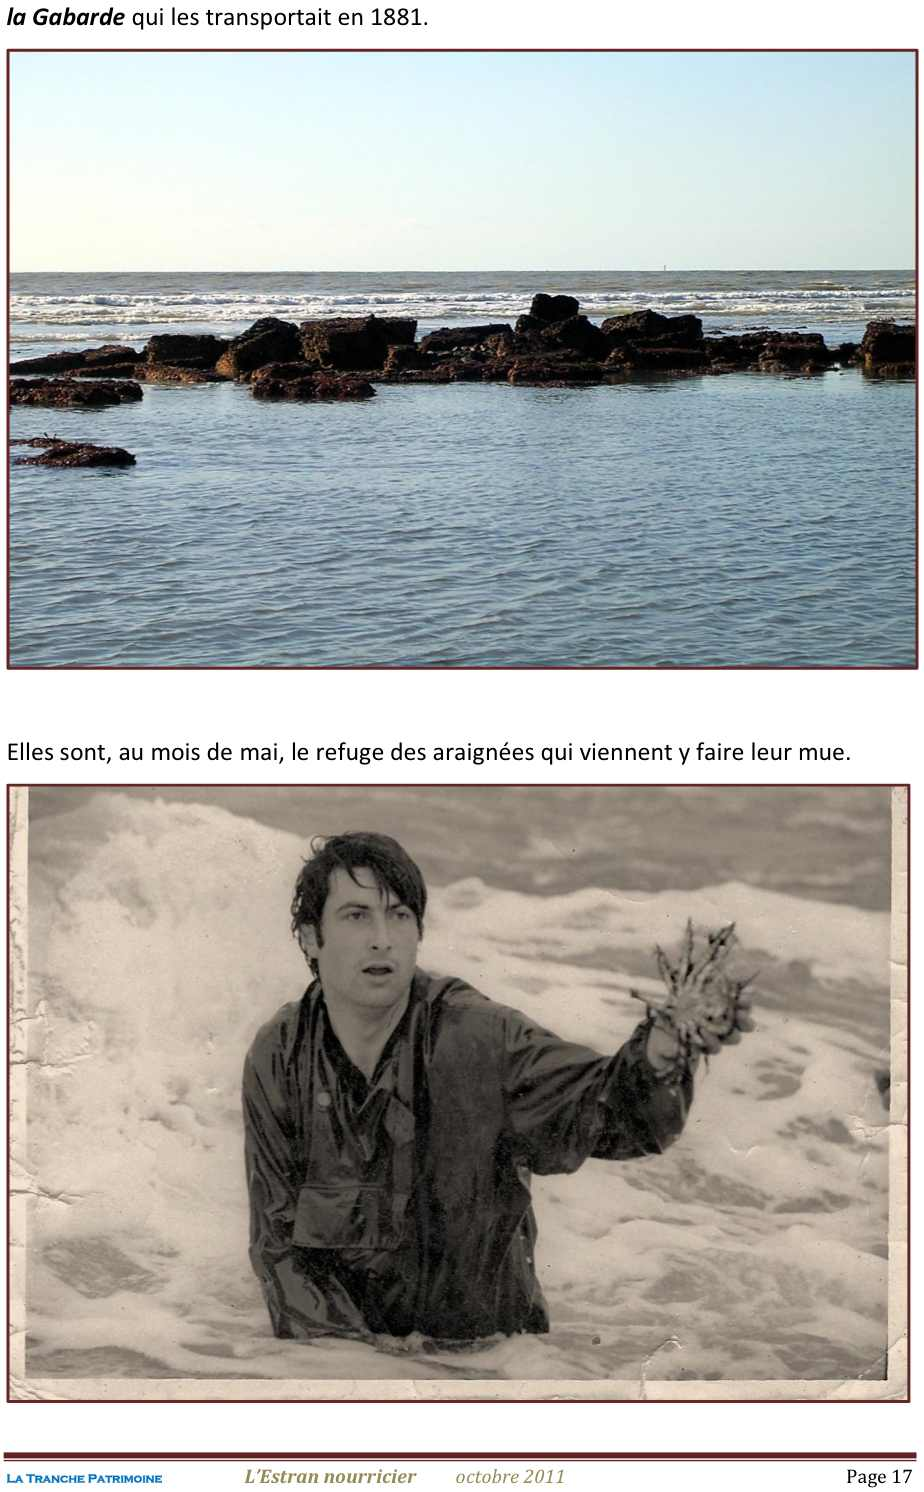 Lestran Nourricier 17 jpeg.jpg